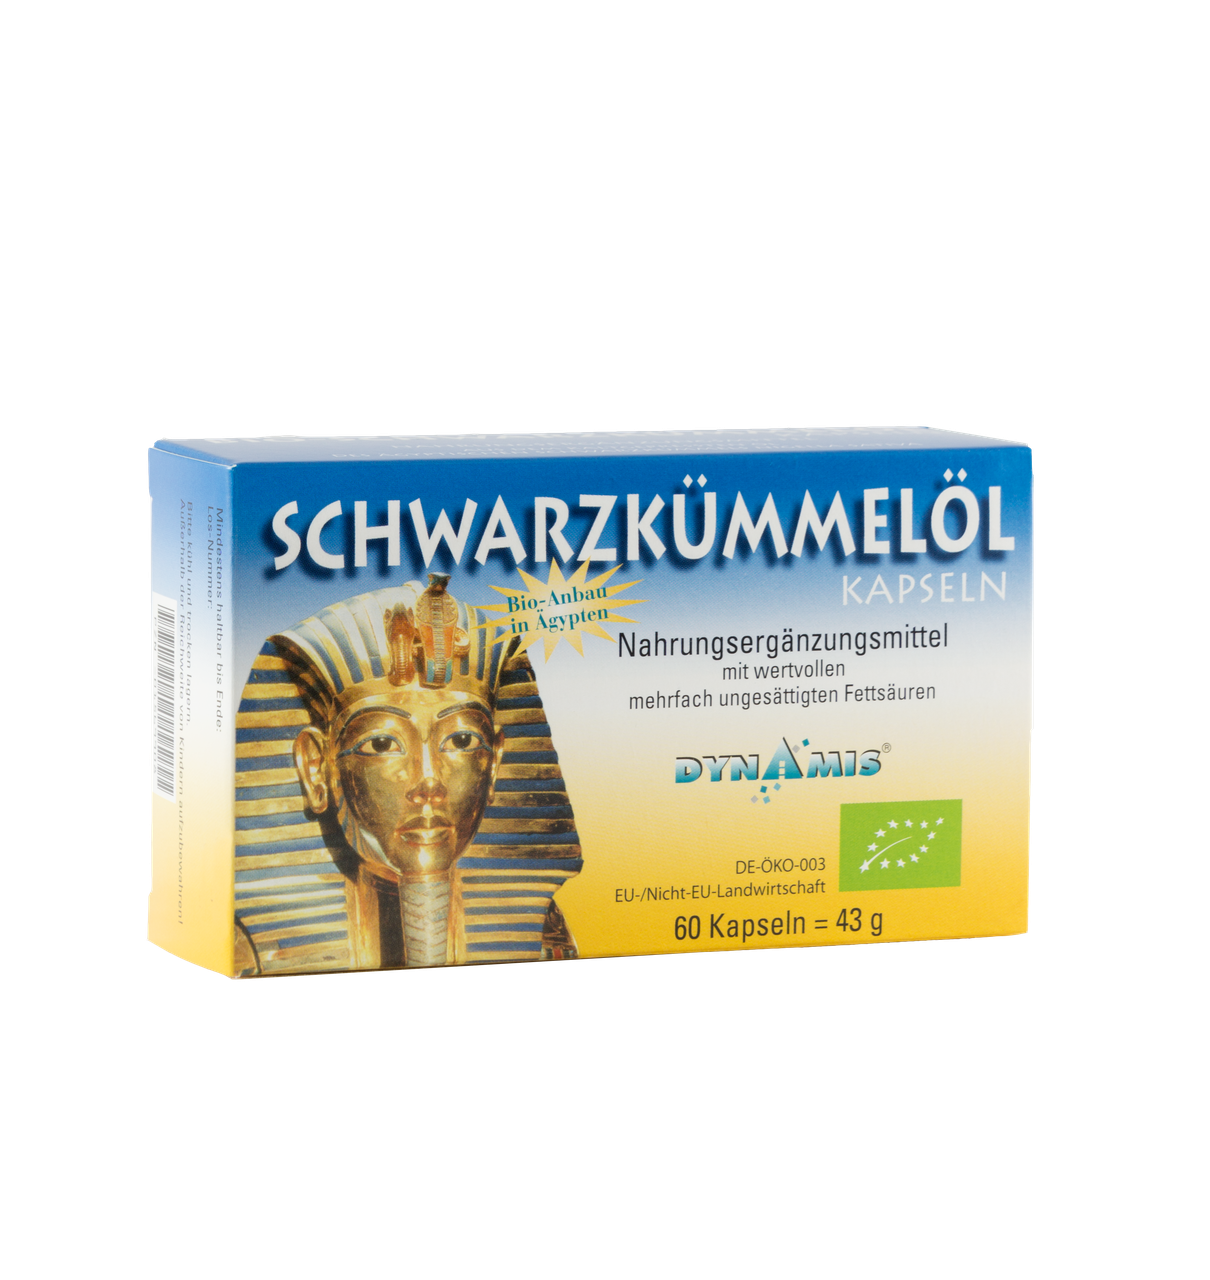 4b46ec190c41c9 BIO Schwarzkümmelöl Kapseln + E - Dynamis Gesundheitsprodukte ...